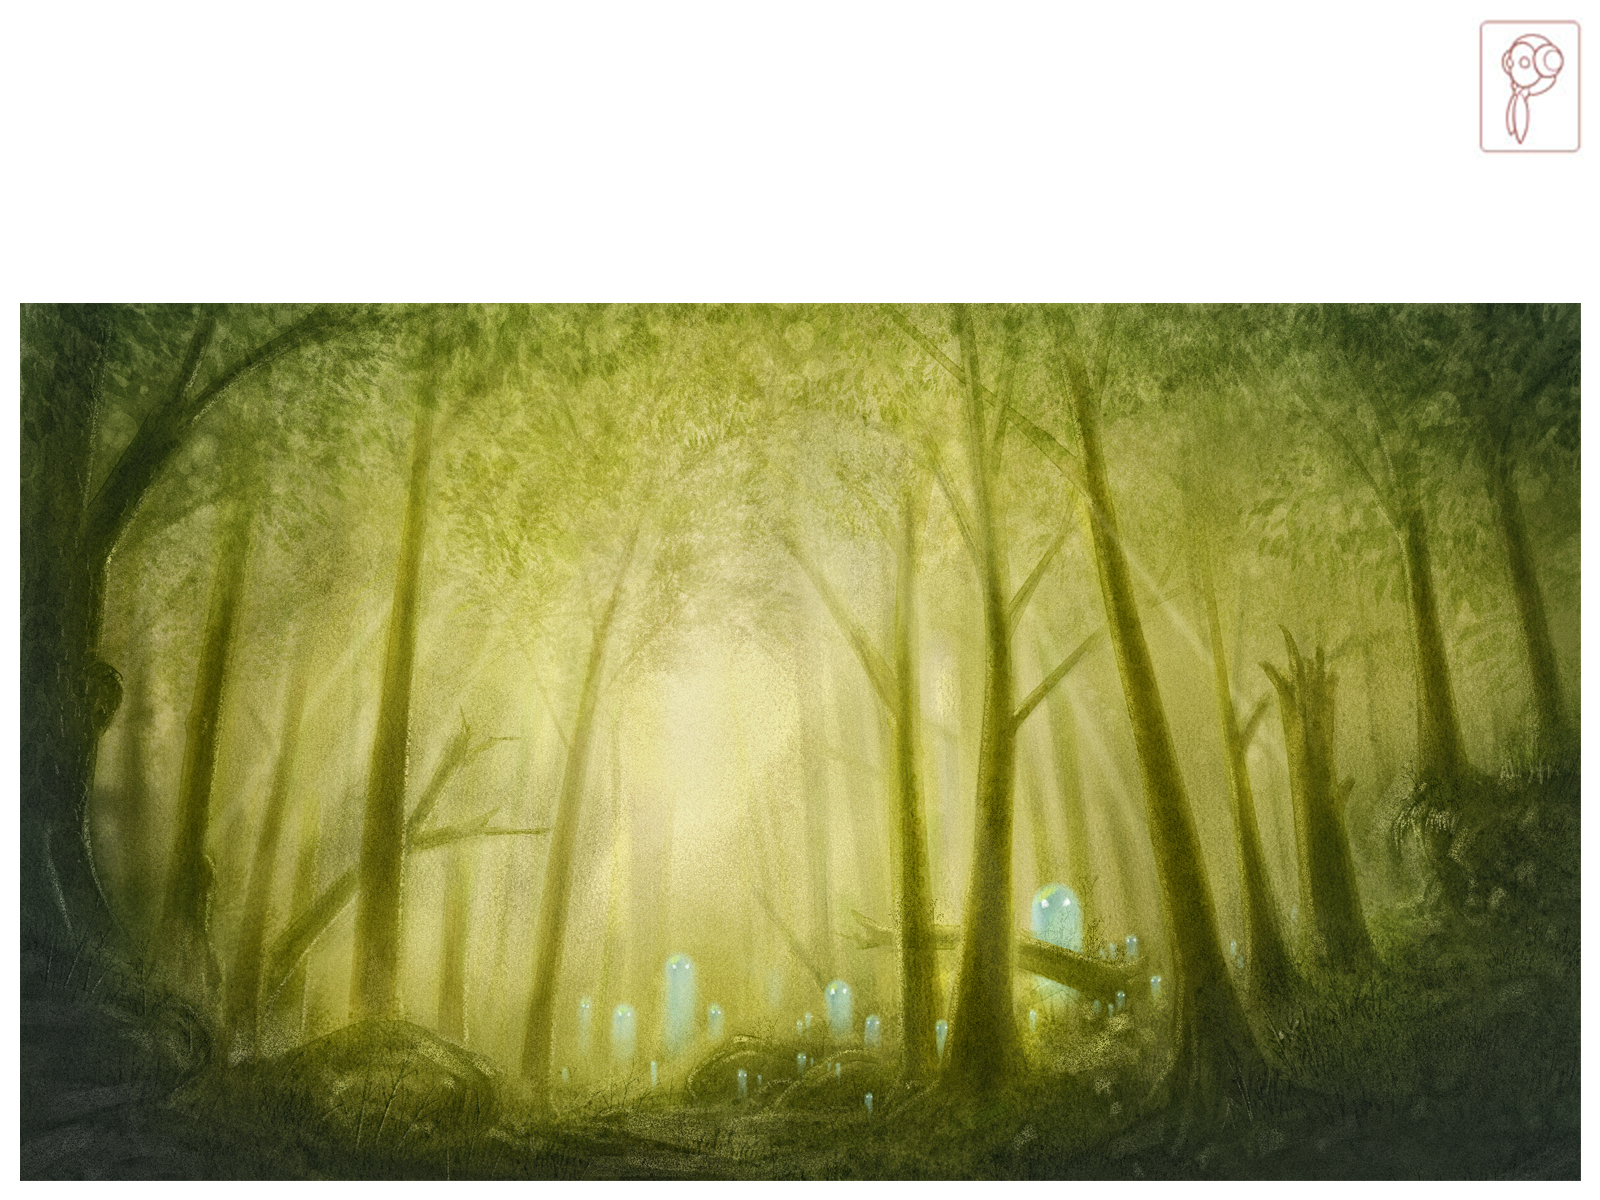 Forrest Ghosts by Papierpilot